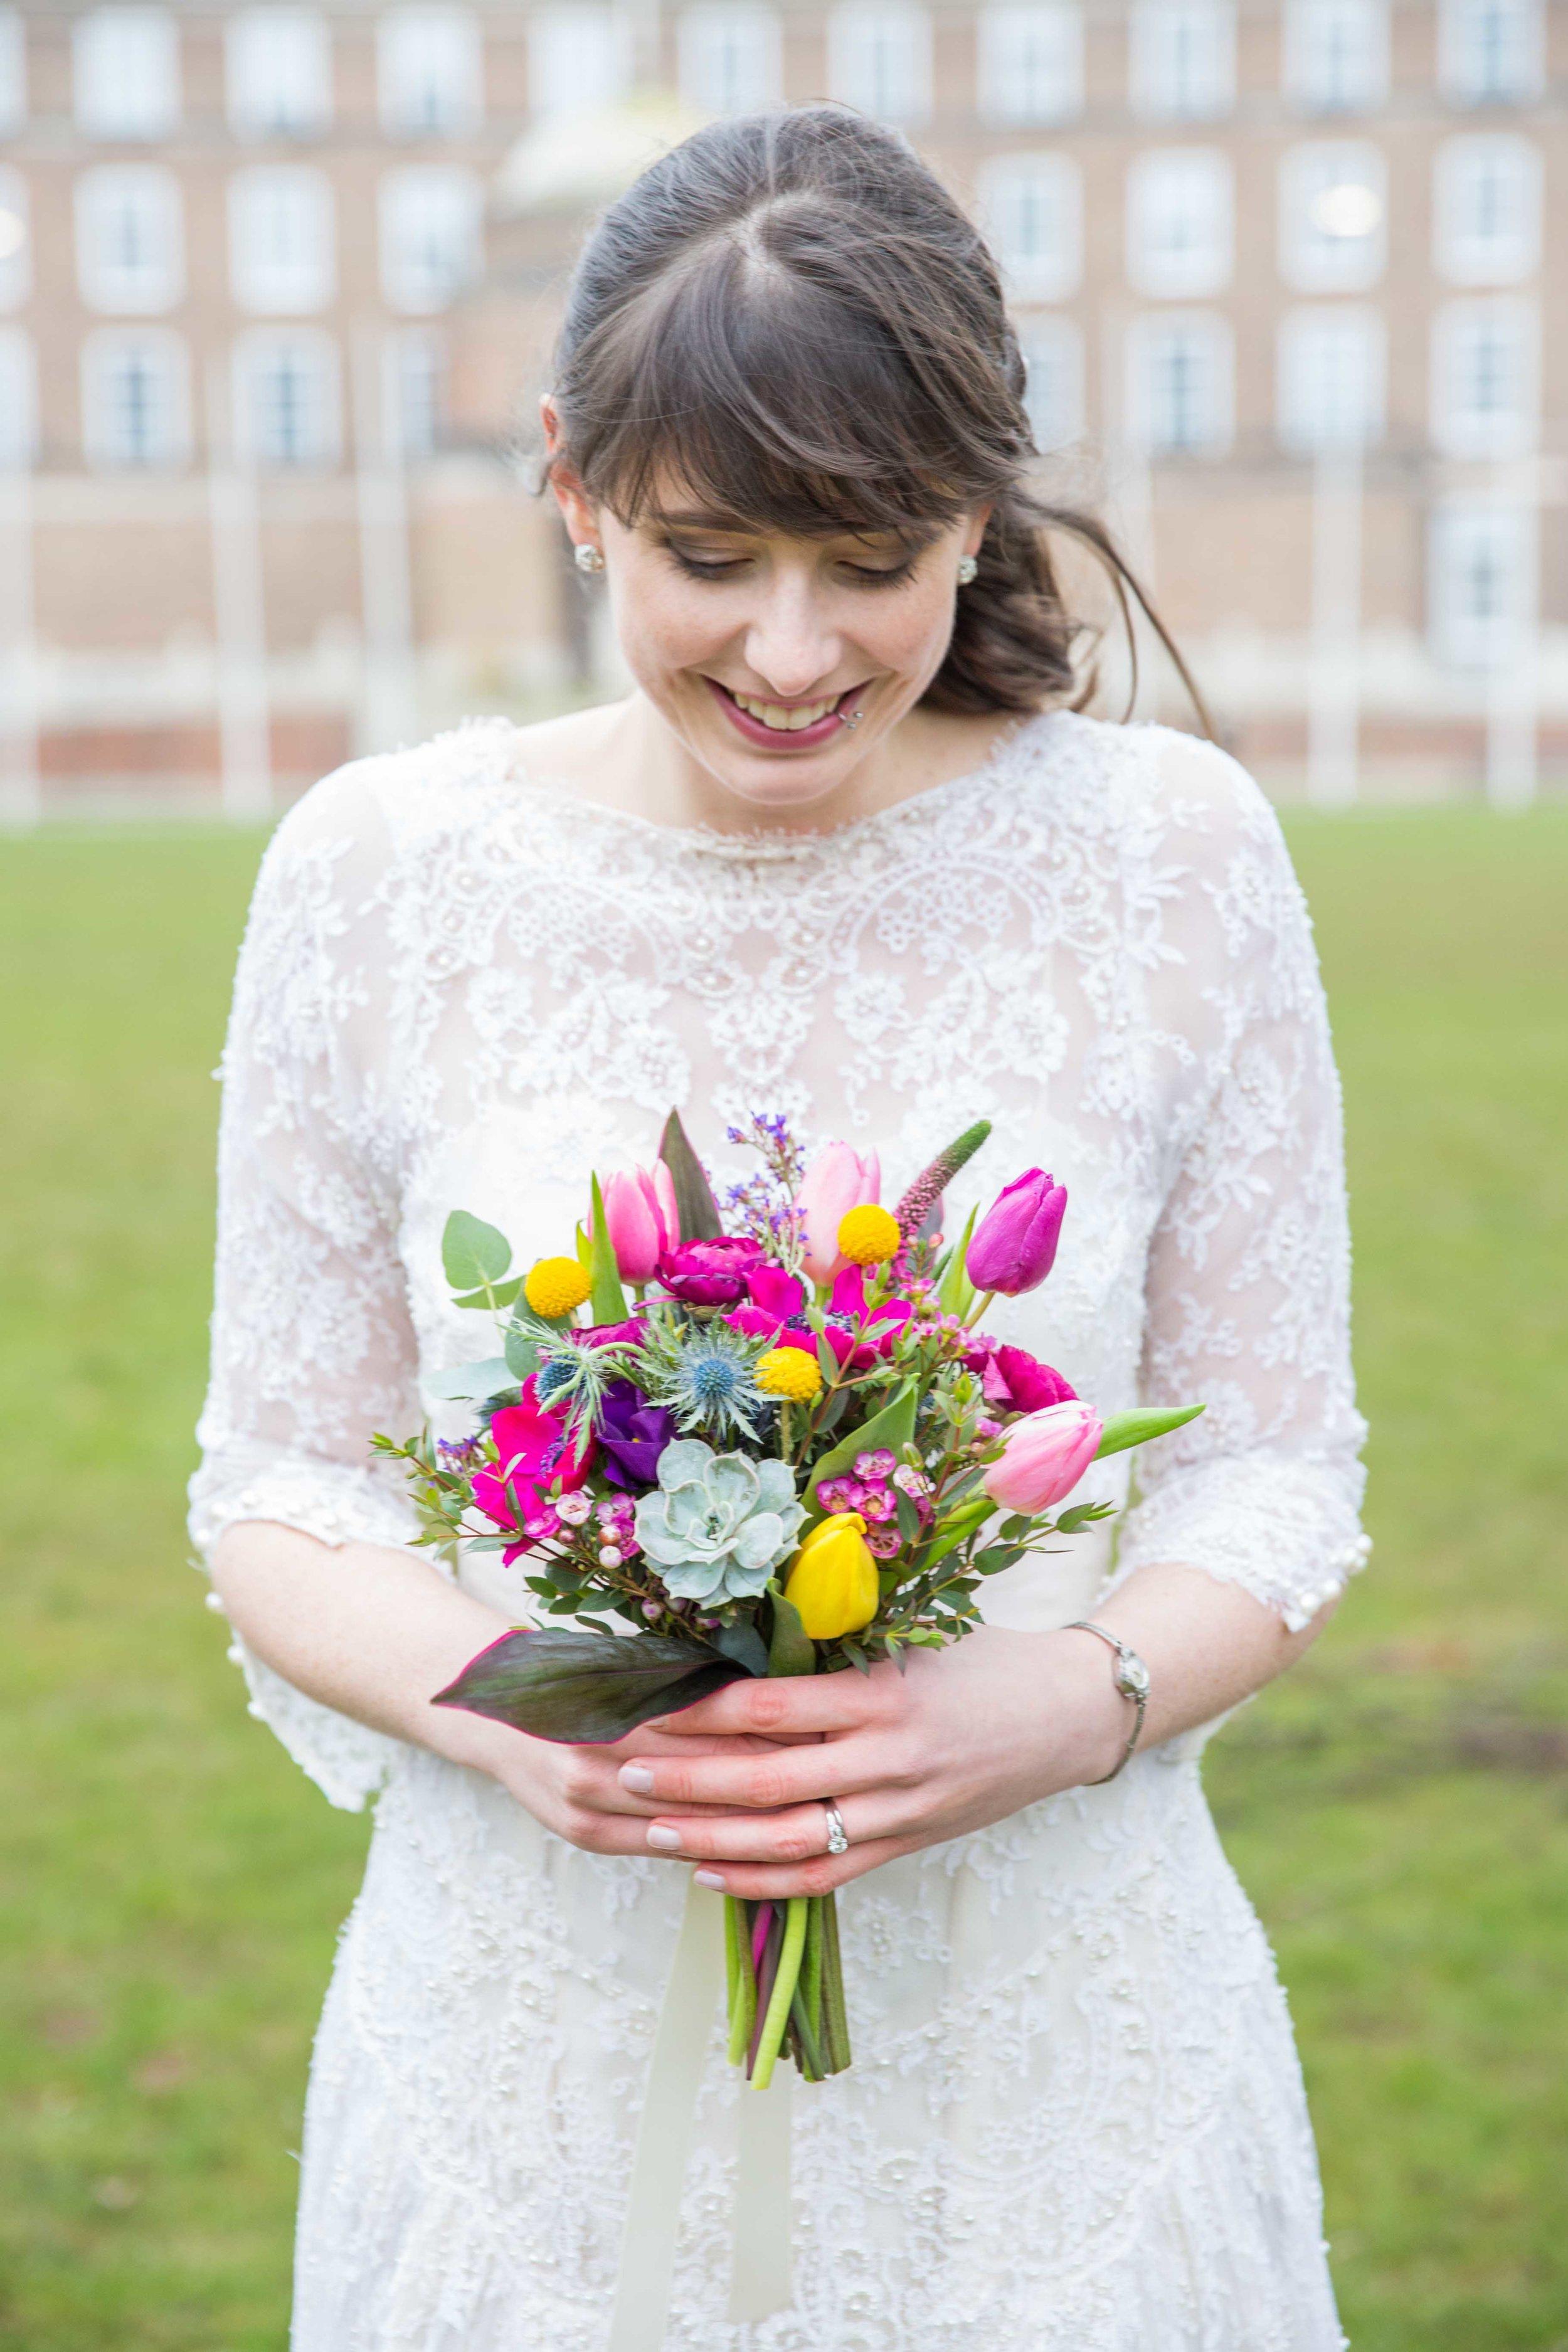 Adam & Faye - Wright Wedding Photography - Bristol Wedding Photographer -266.jpg